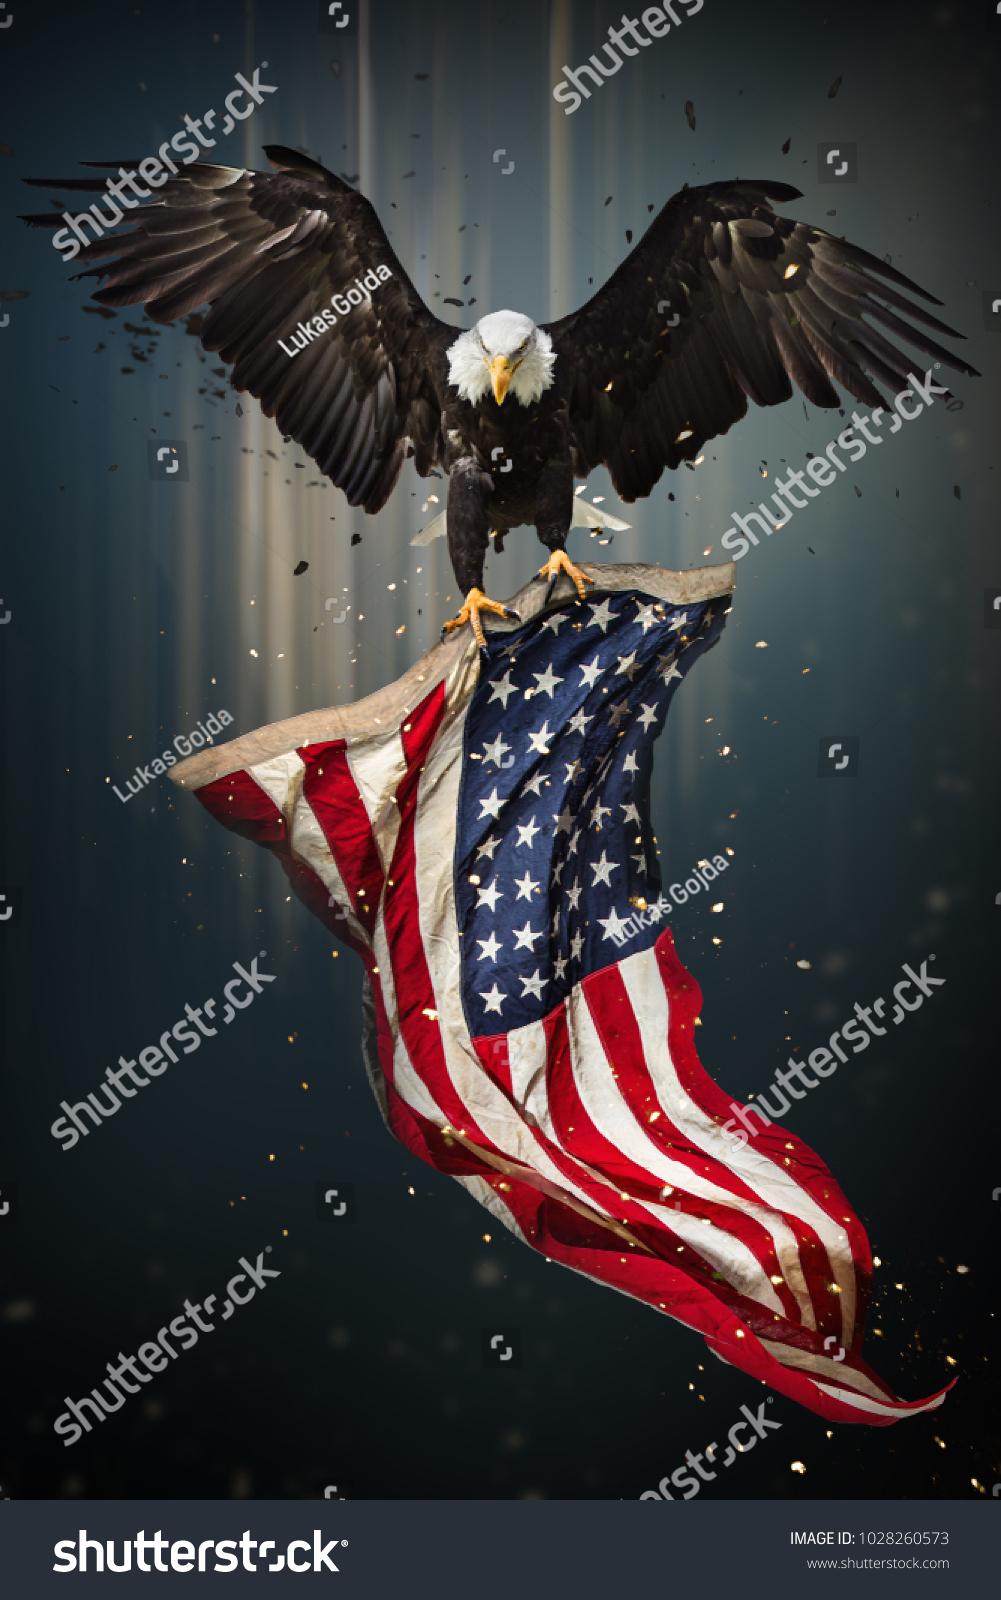 American bald eagle flying symbol america stock photo 1028260573 american bald eagle flying symbol of america with flag united states of america buycottarizona Choice Image